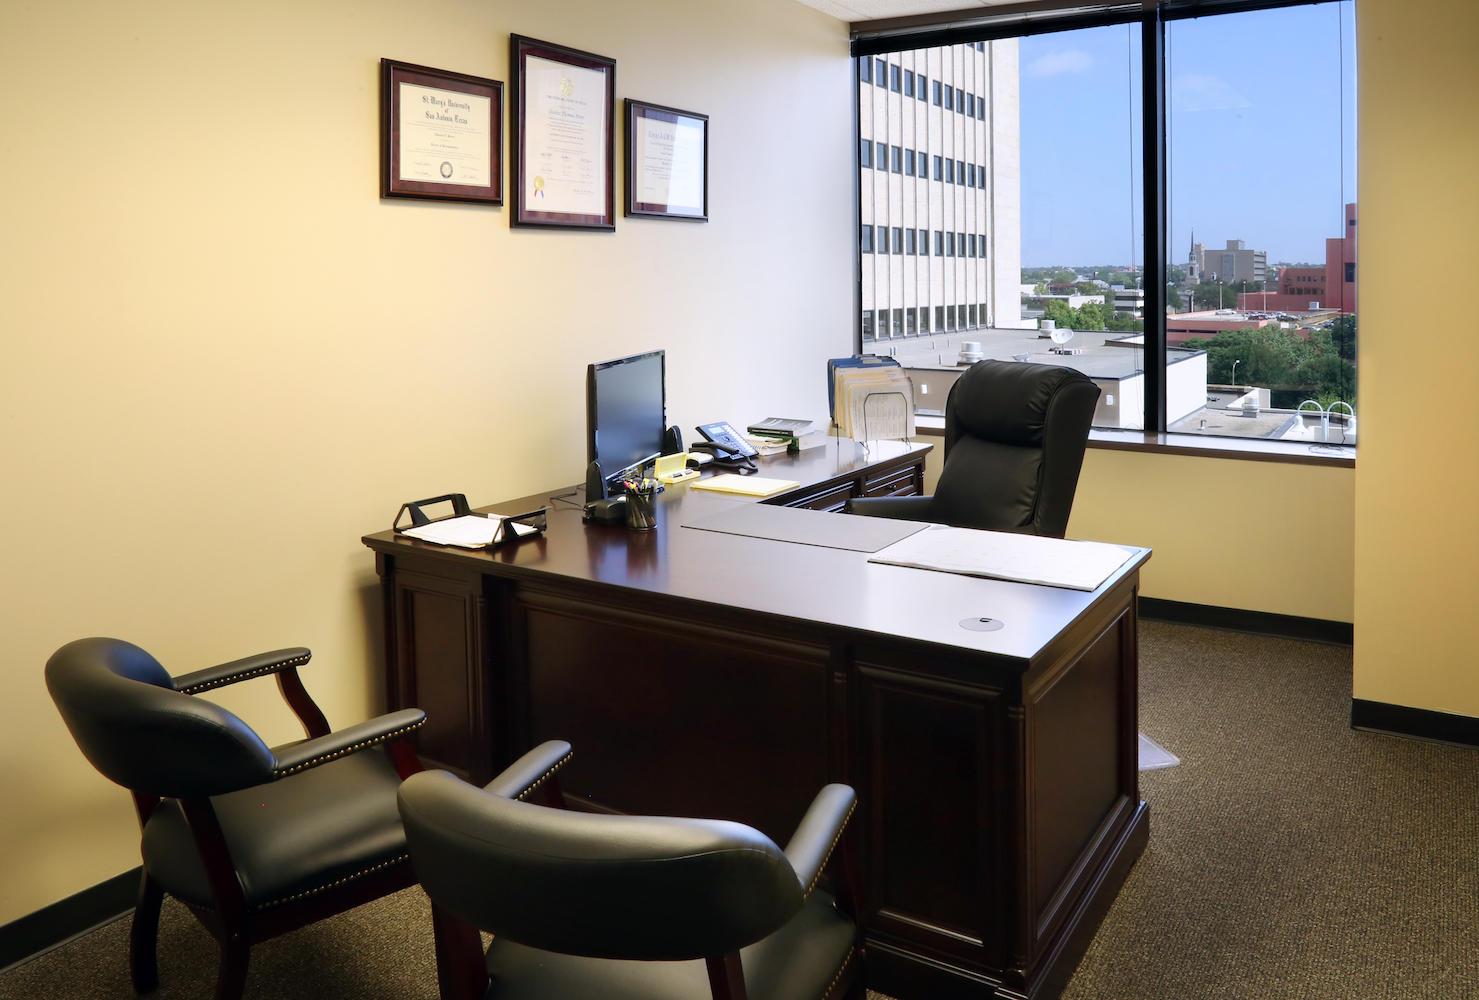 Dunham & Jones, San Antonio DWI Attorneys image 3